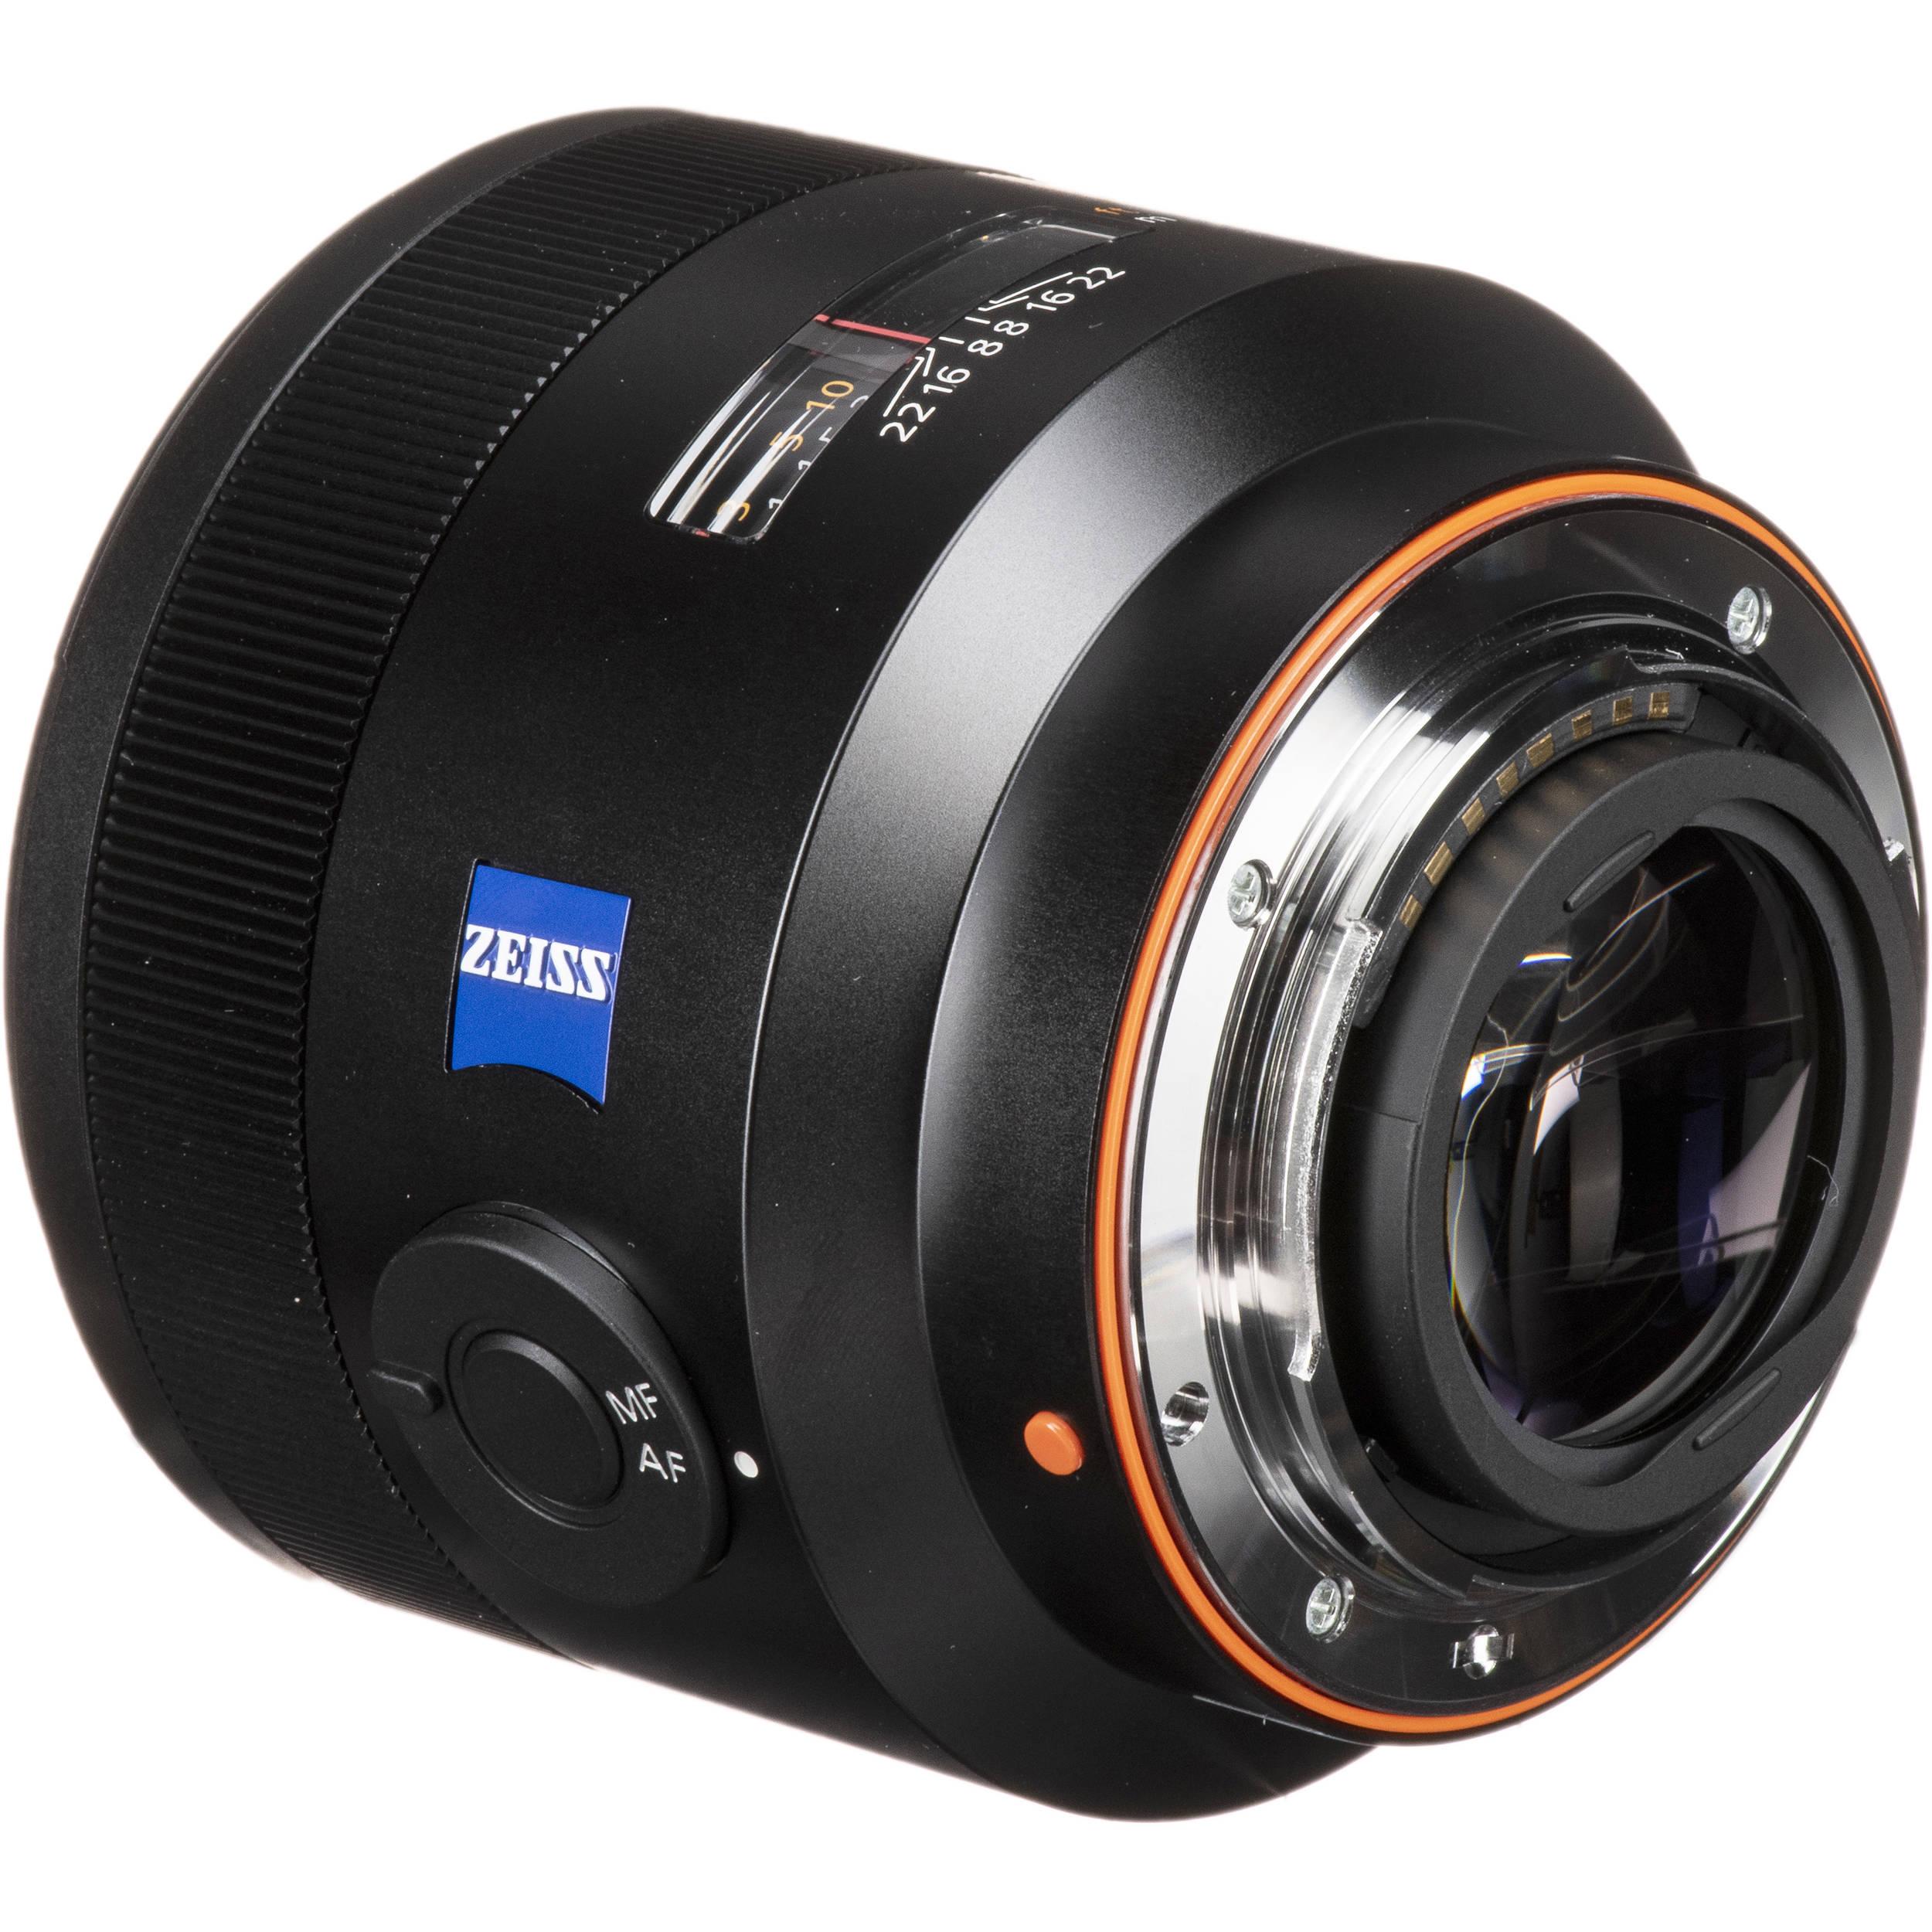 72mm Circular Polarizing Filter for Sony Carl Zeiss Planar T* 50mm F1.4 ZA SSM